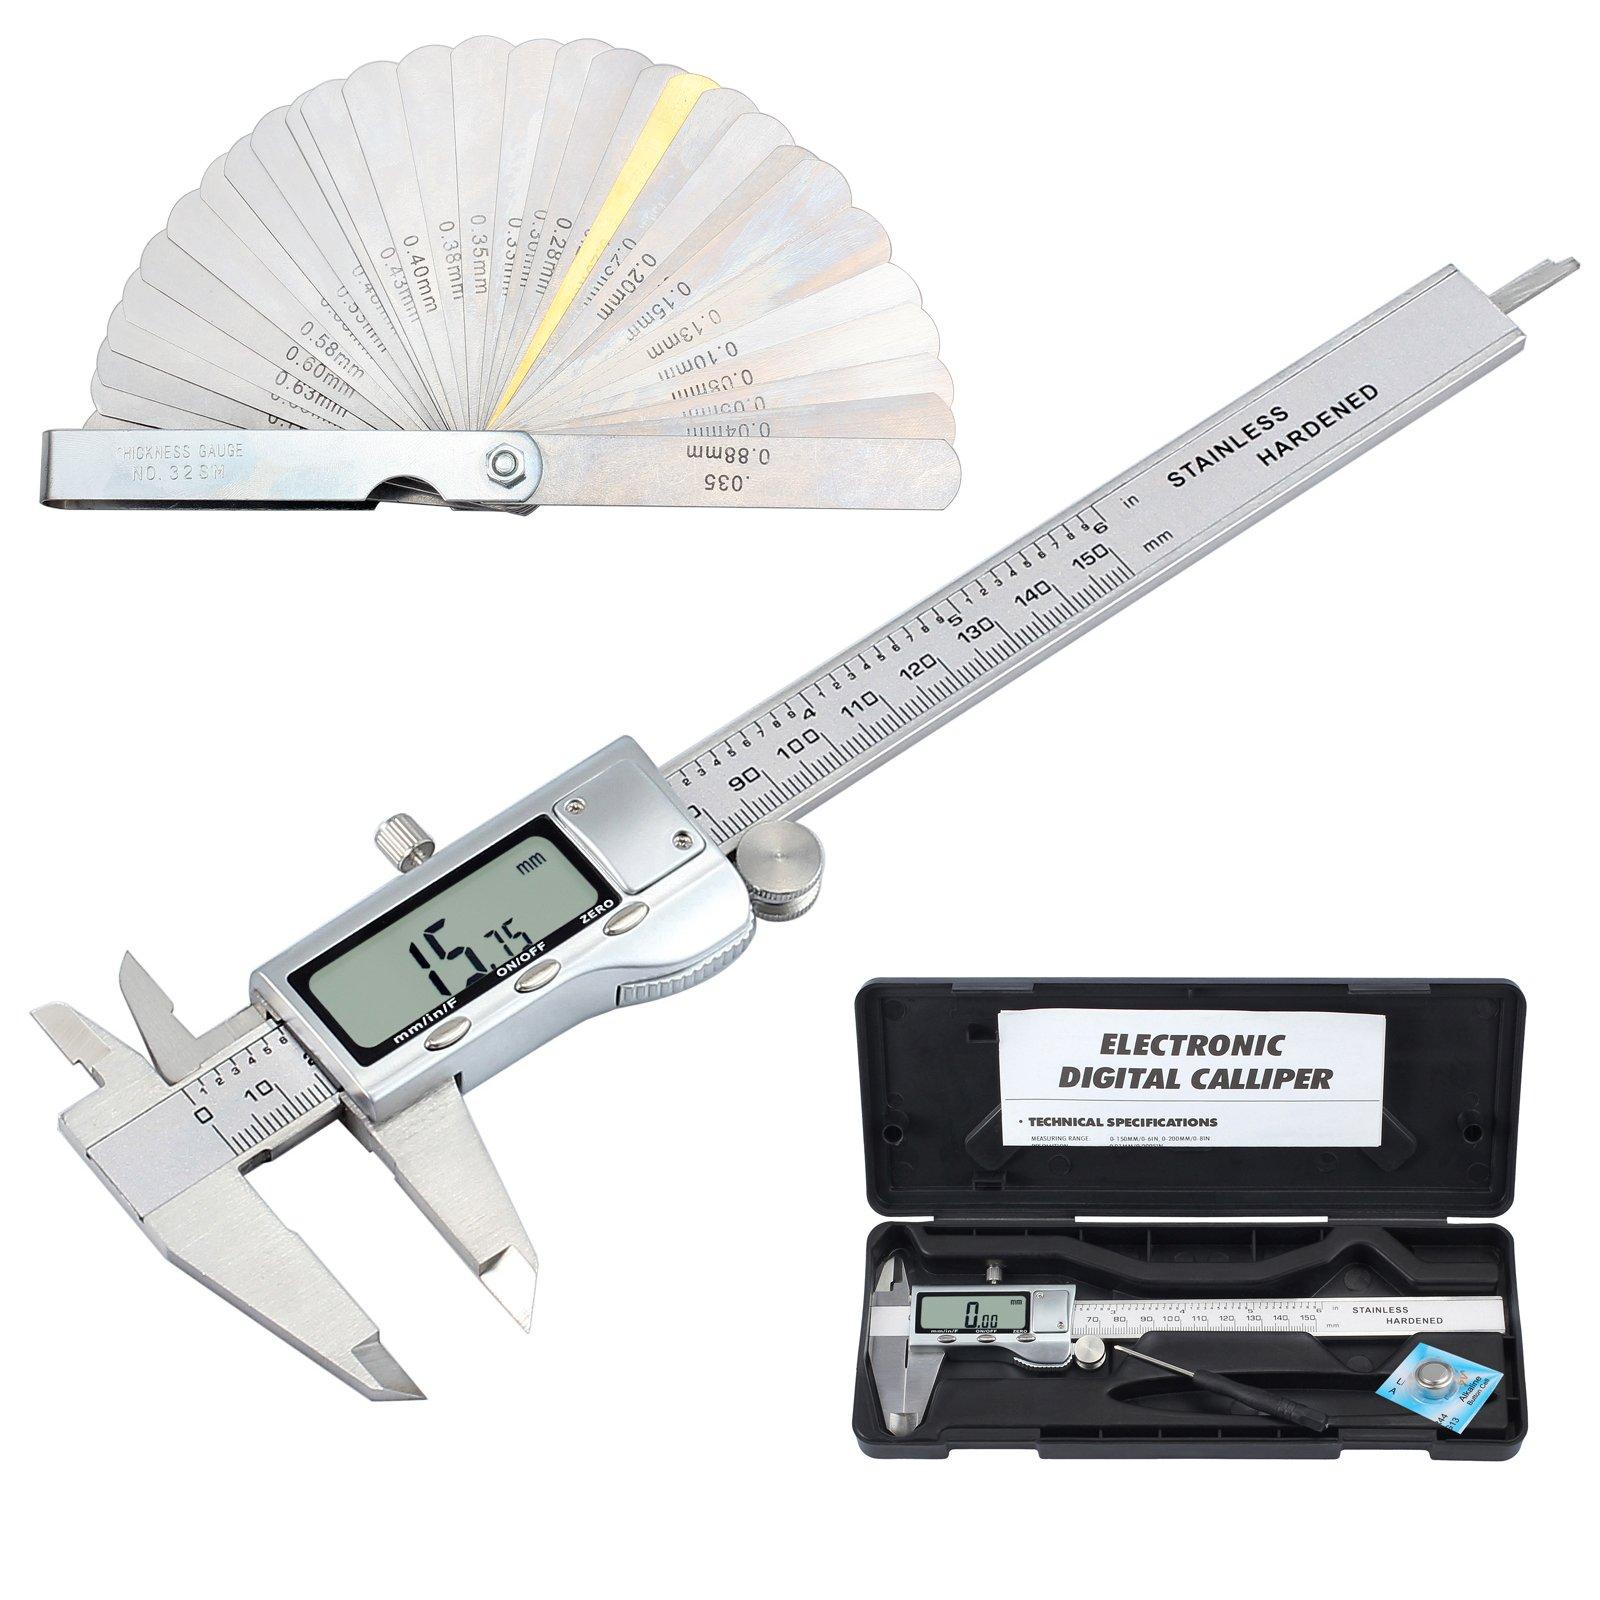 Digital Vernier Caliper + Feeler Gauge Neoteck 150mm/6Inch Stainless Steel Electronic Caliper Fractions/Inch/Metric Conversion Measuring Tool for Length Width Depth Inner Diameter Outer Diameter